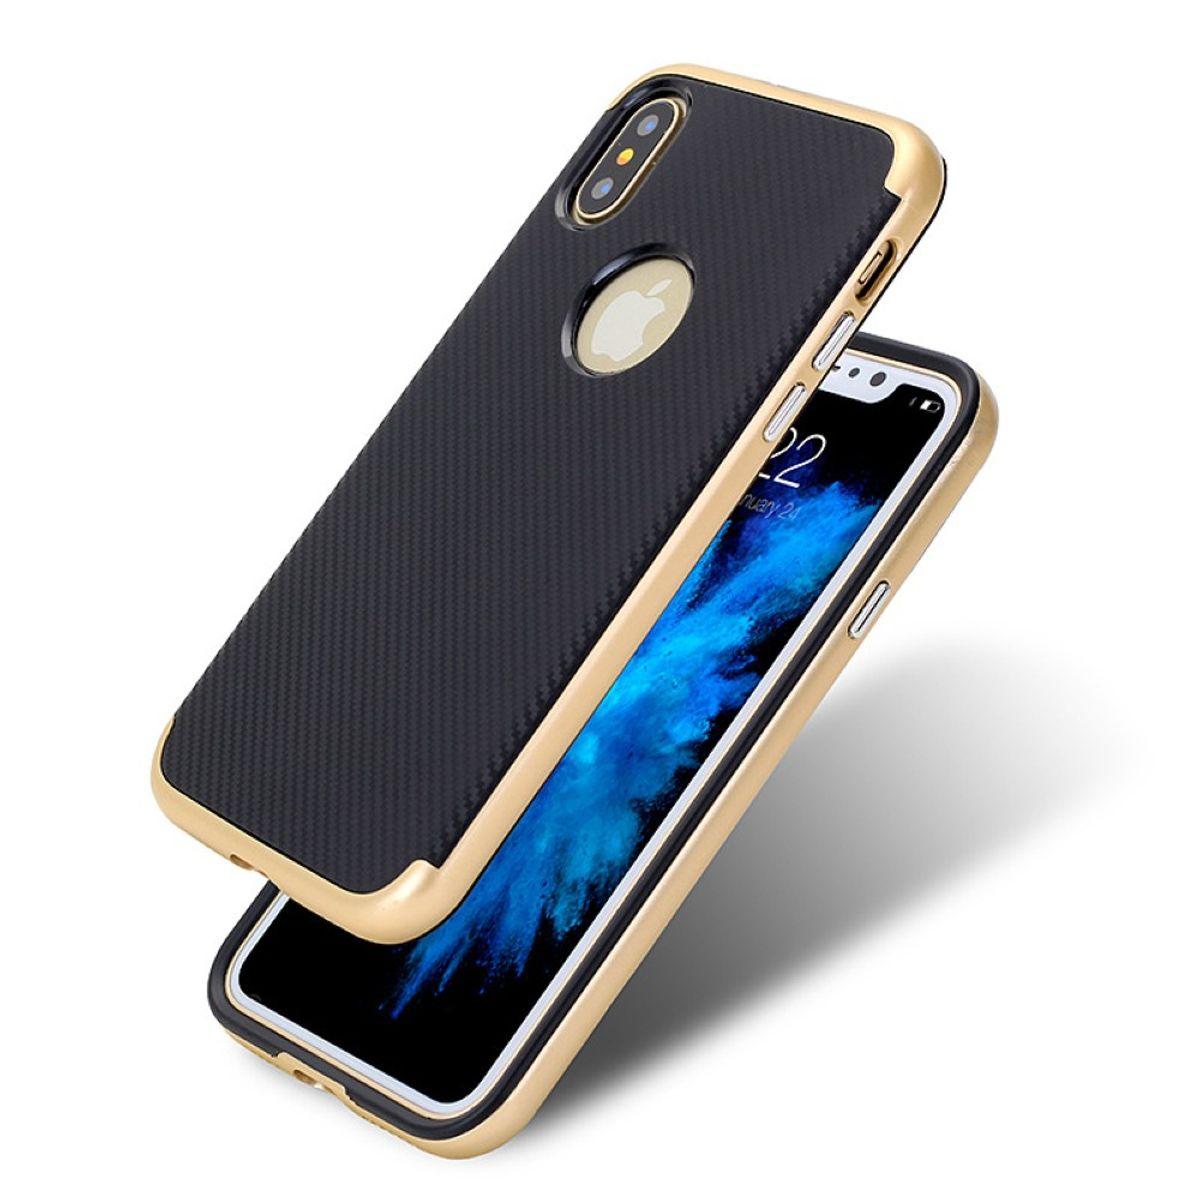 Hybrid Silikon Handy Hülle für Apple iPhone XS Case Cover Tasche Gold